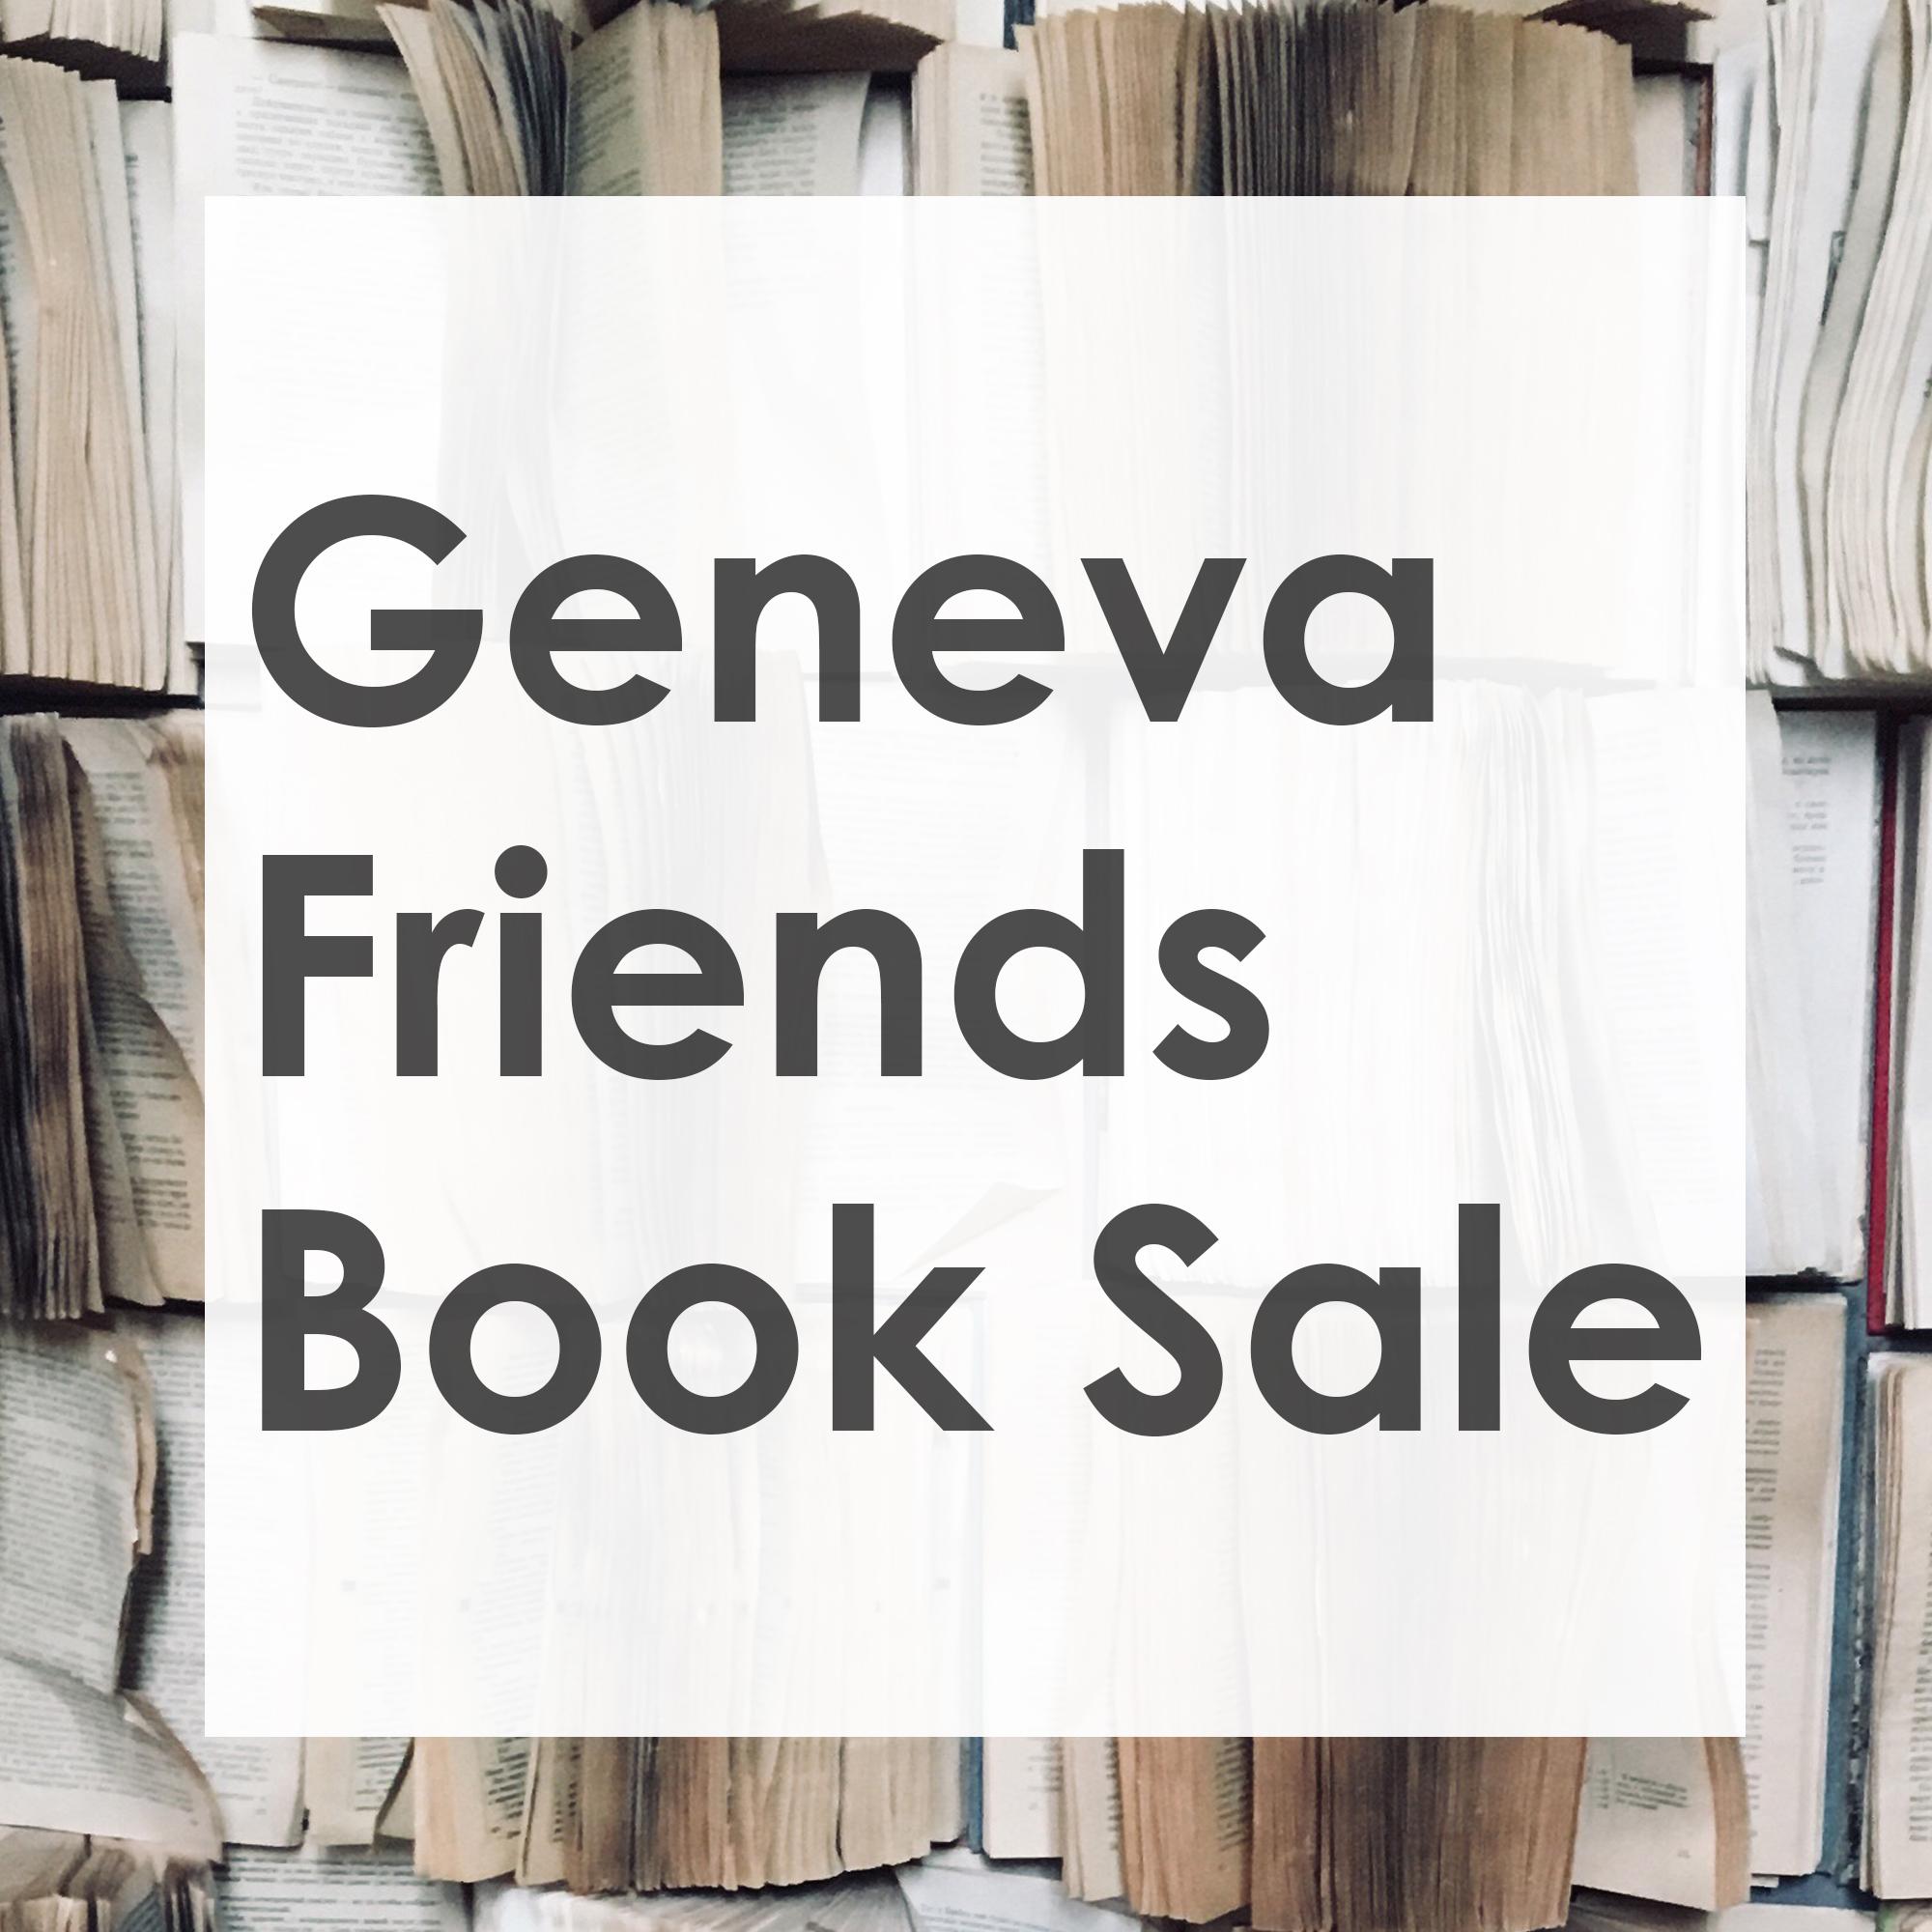 Friends of Geneva Library Book Sale